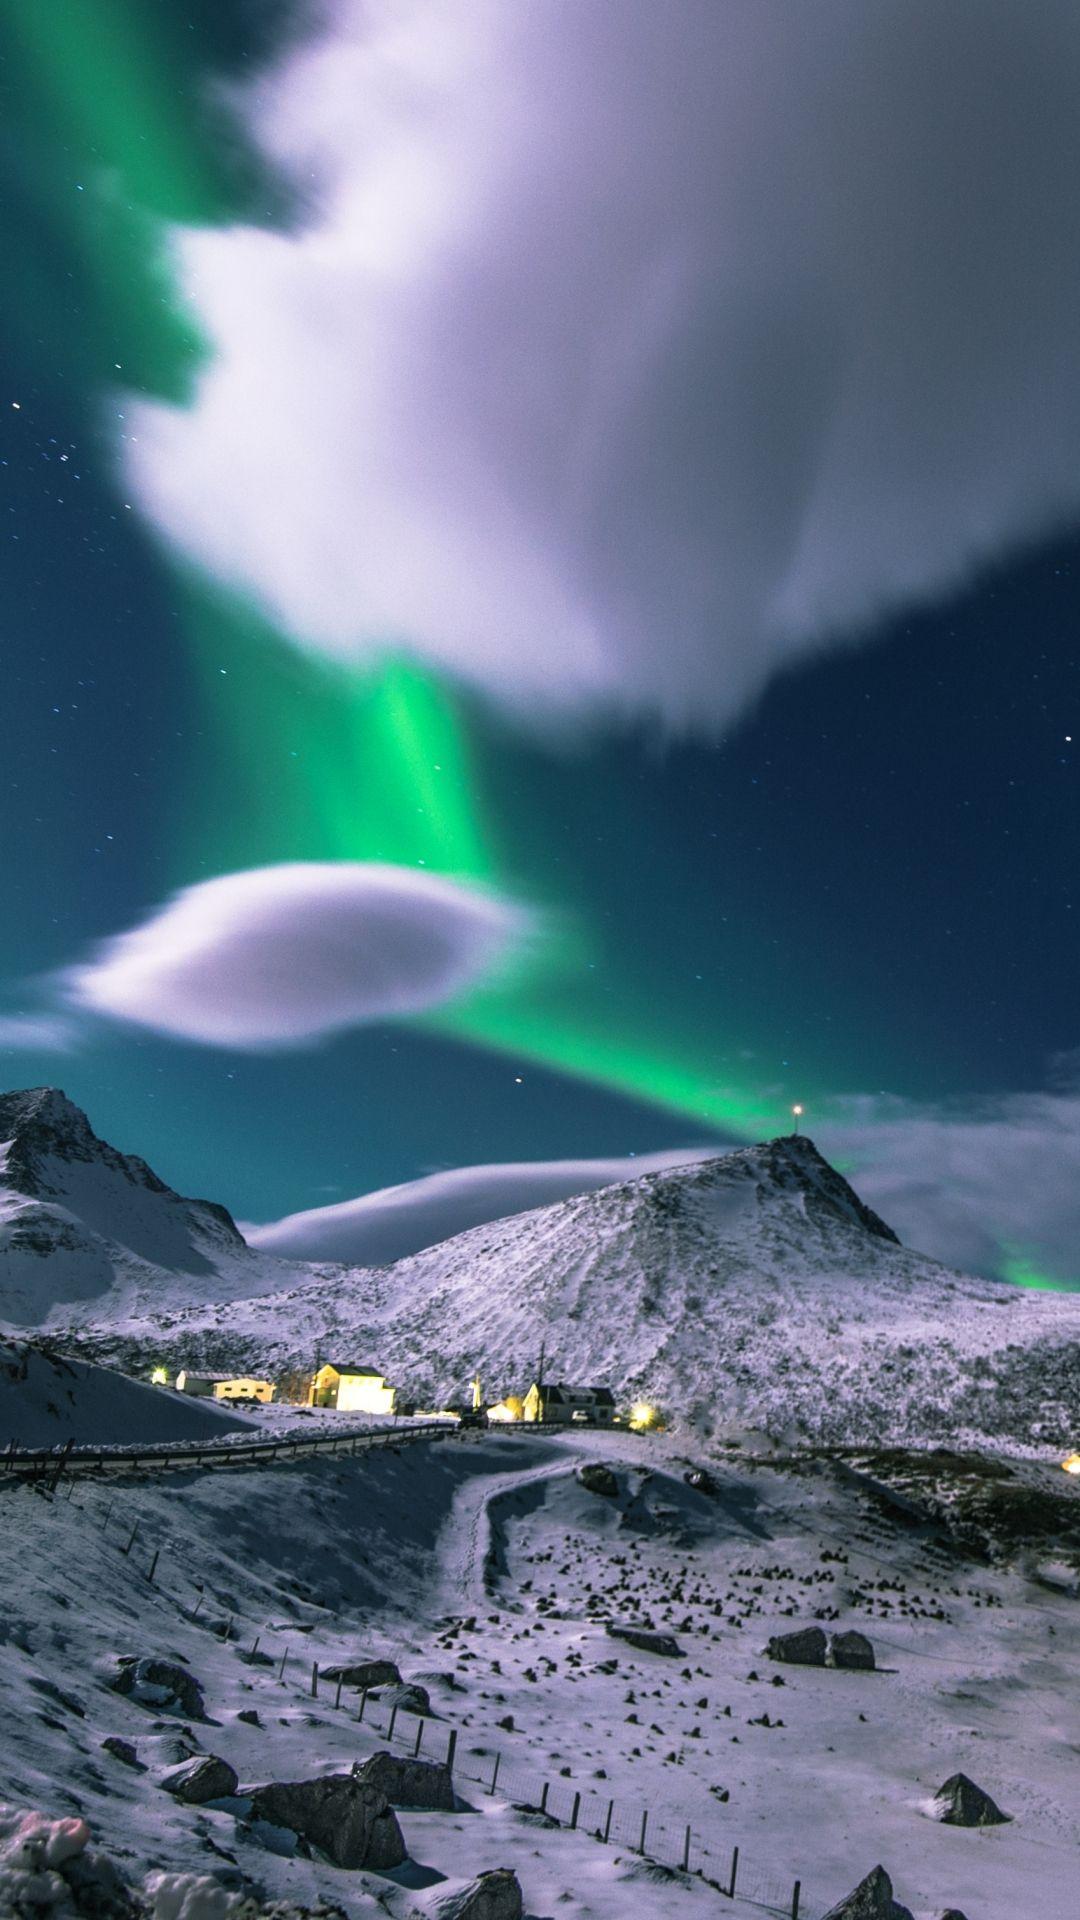 Earth Aurora Borealis Myrland Lofoten Islands Norway